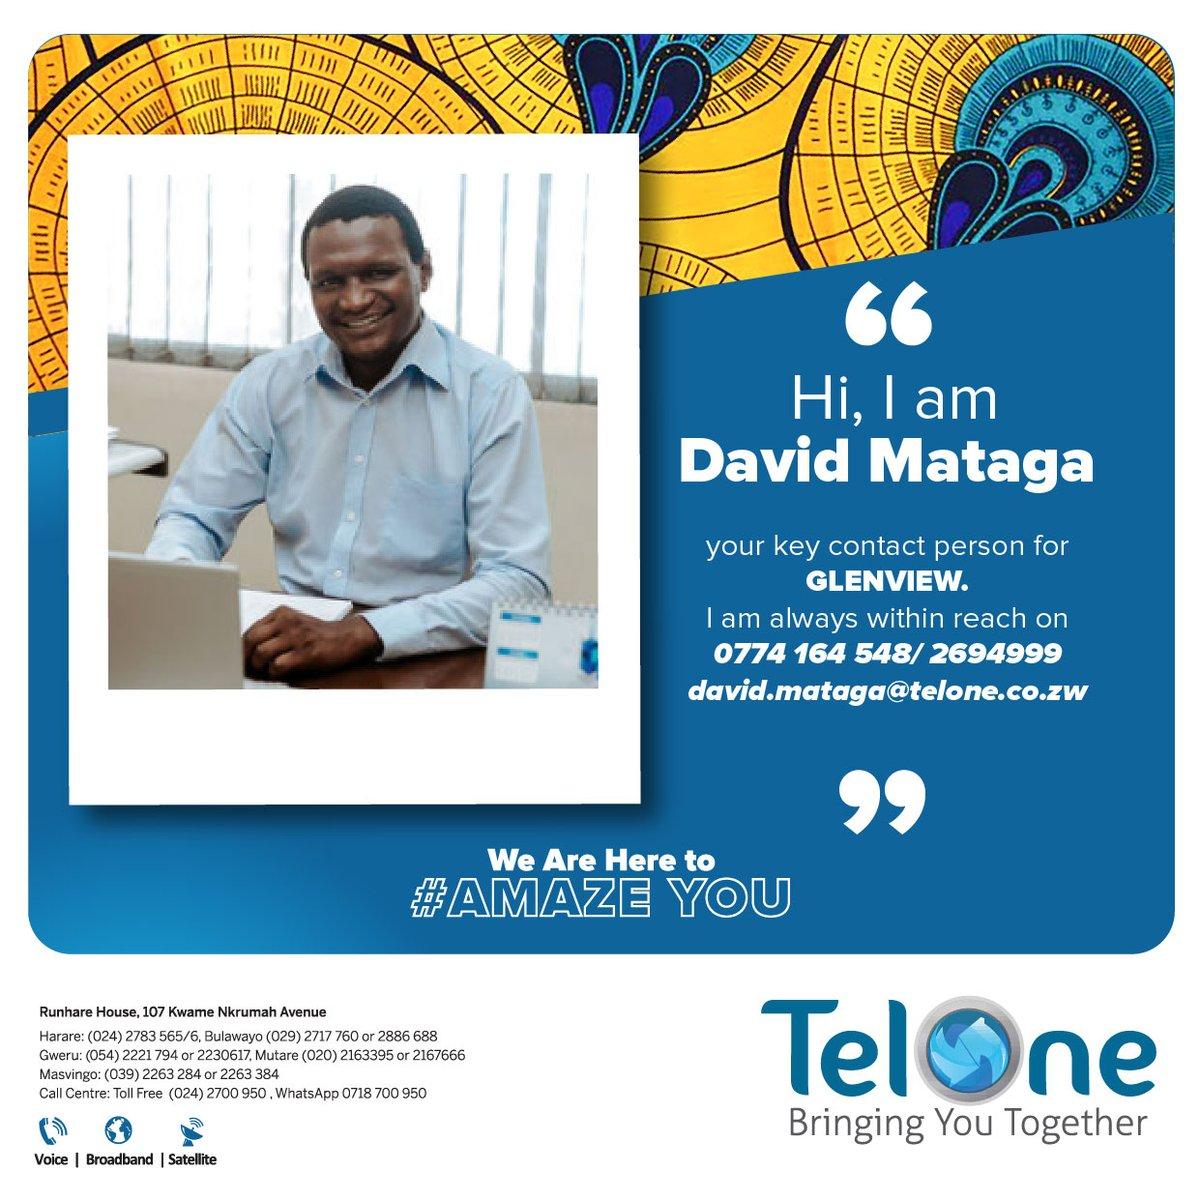 Meet Mr David Matanga your key contact person for Glenview. You can reach him on 0774 164 548 / 2694999. #WeAreHereToAmazeYou https://t.co/AkFiWhJGNJ